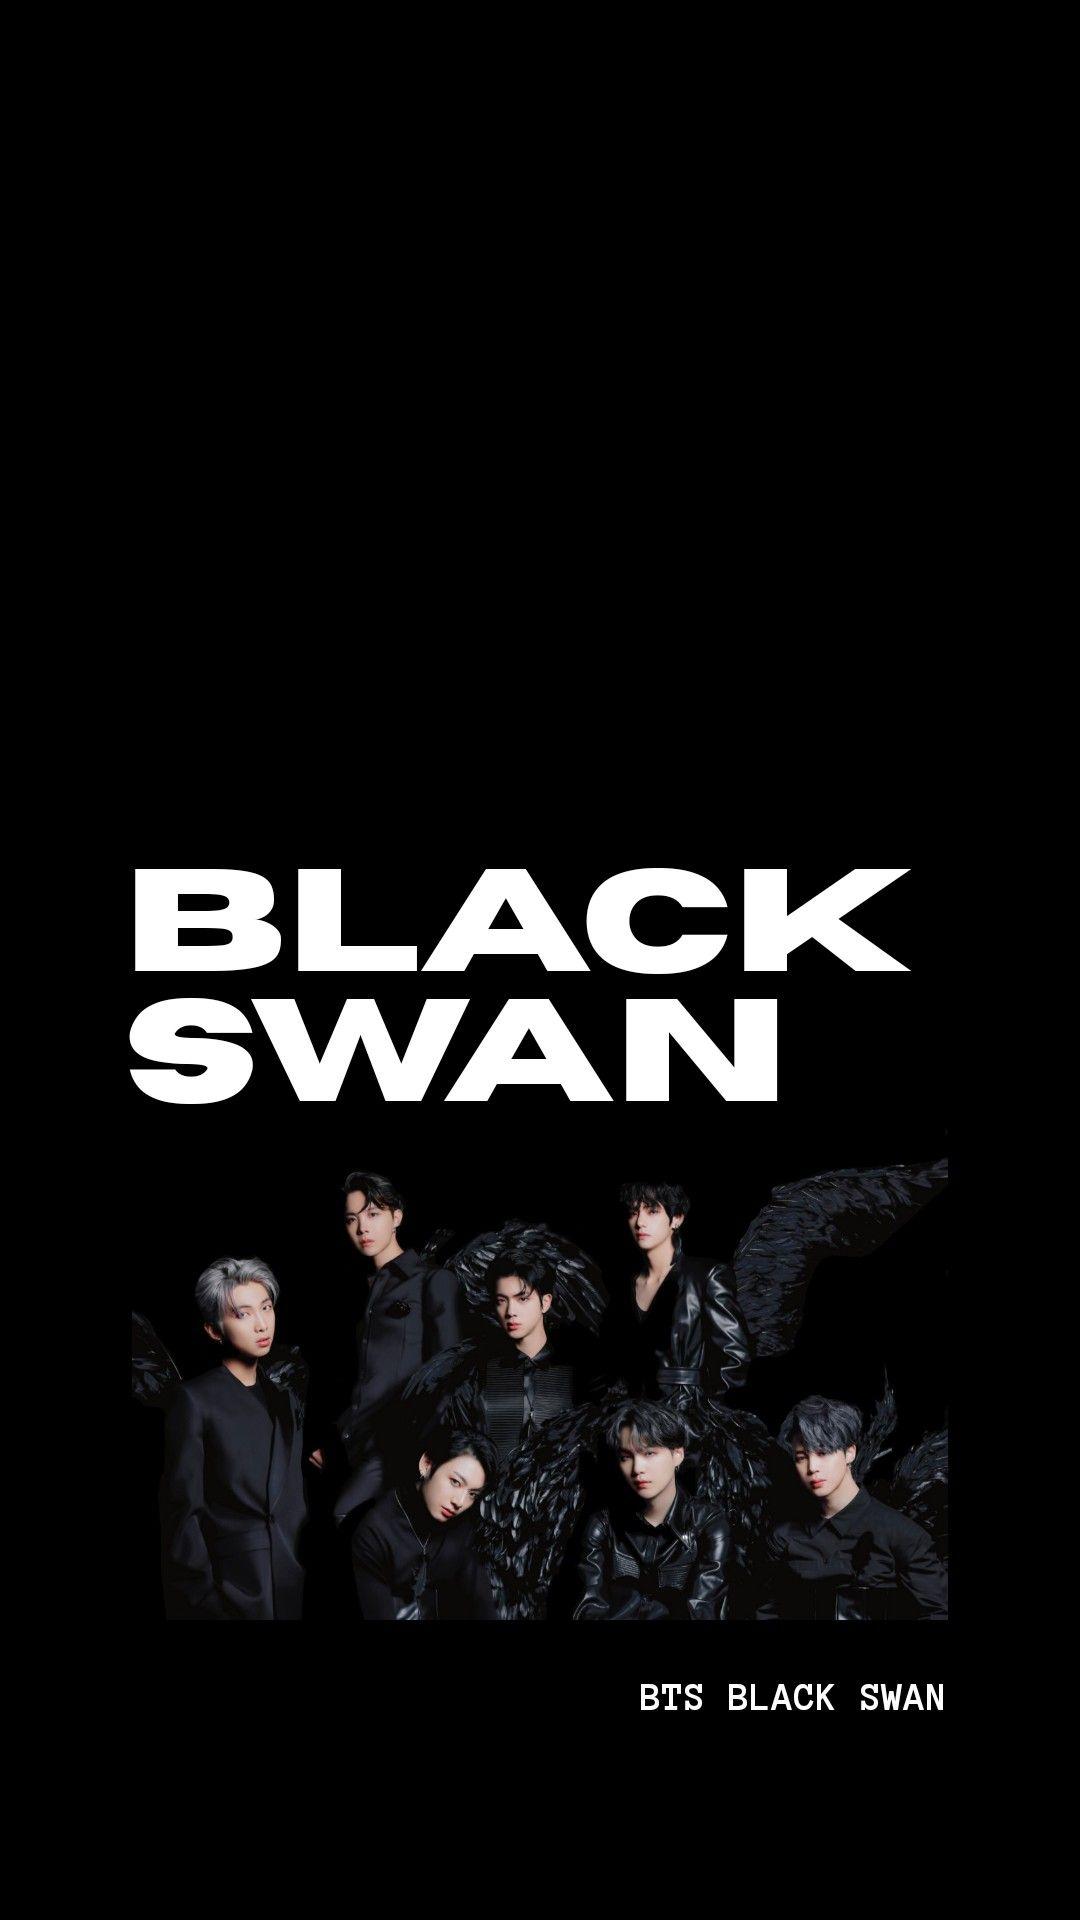 Reina On Twitter In 2020 Bts Wallpaper Bts Concept Photo Swan Wallpaper